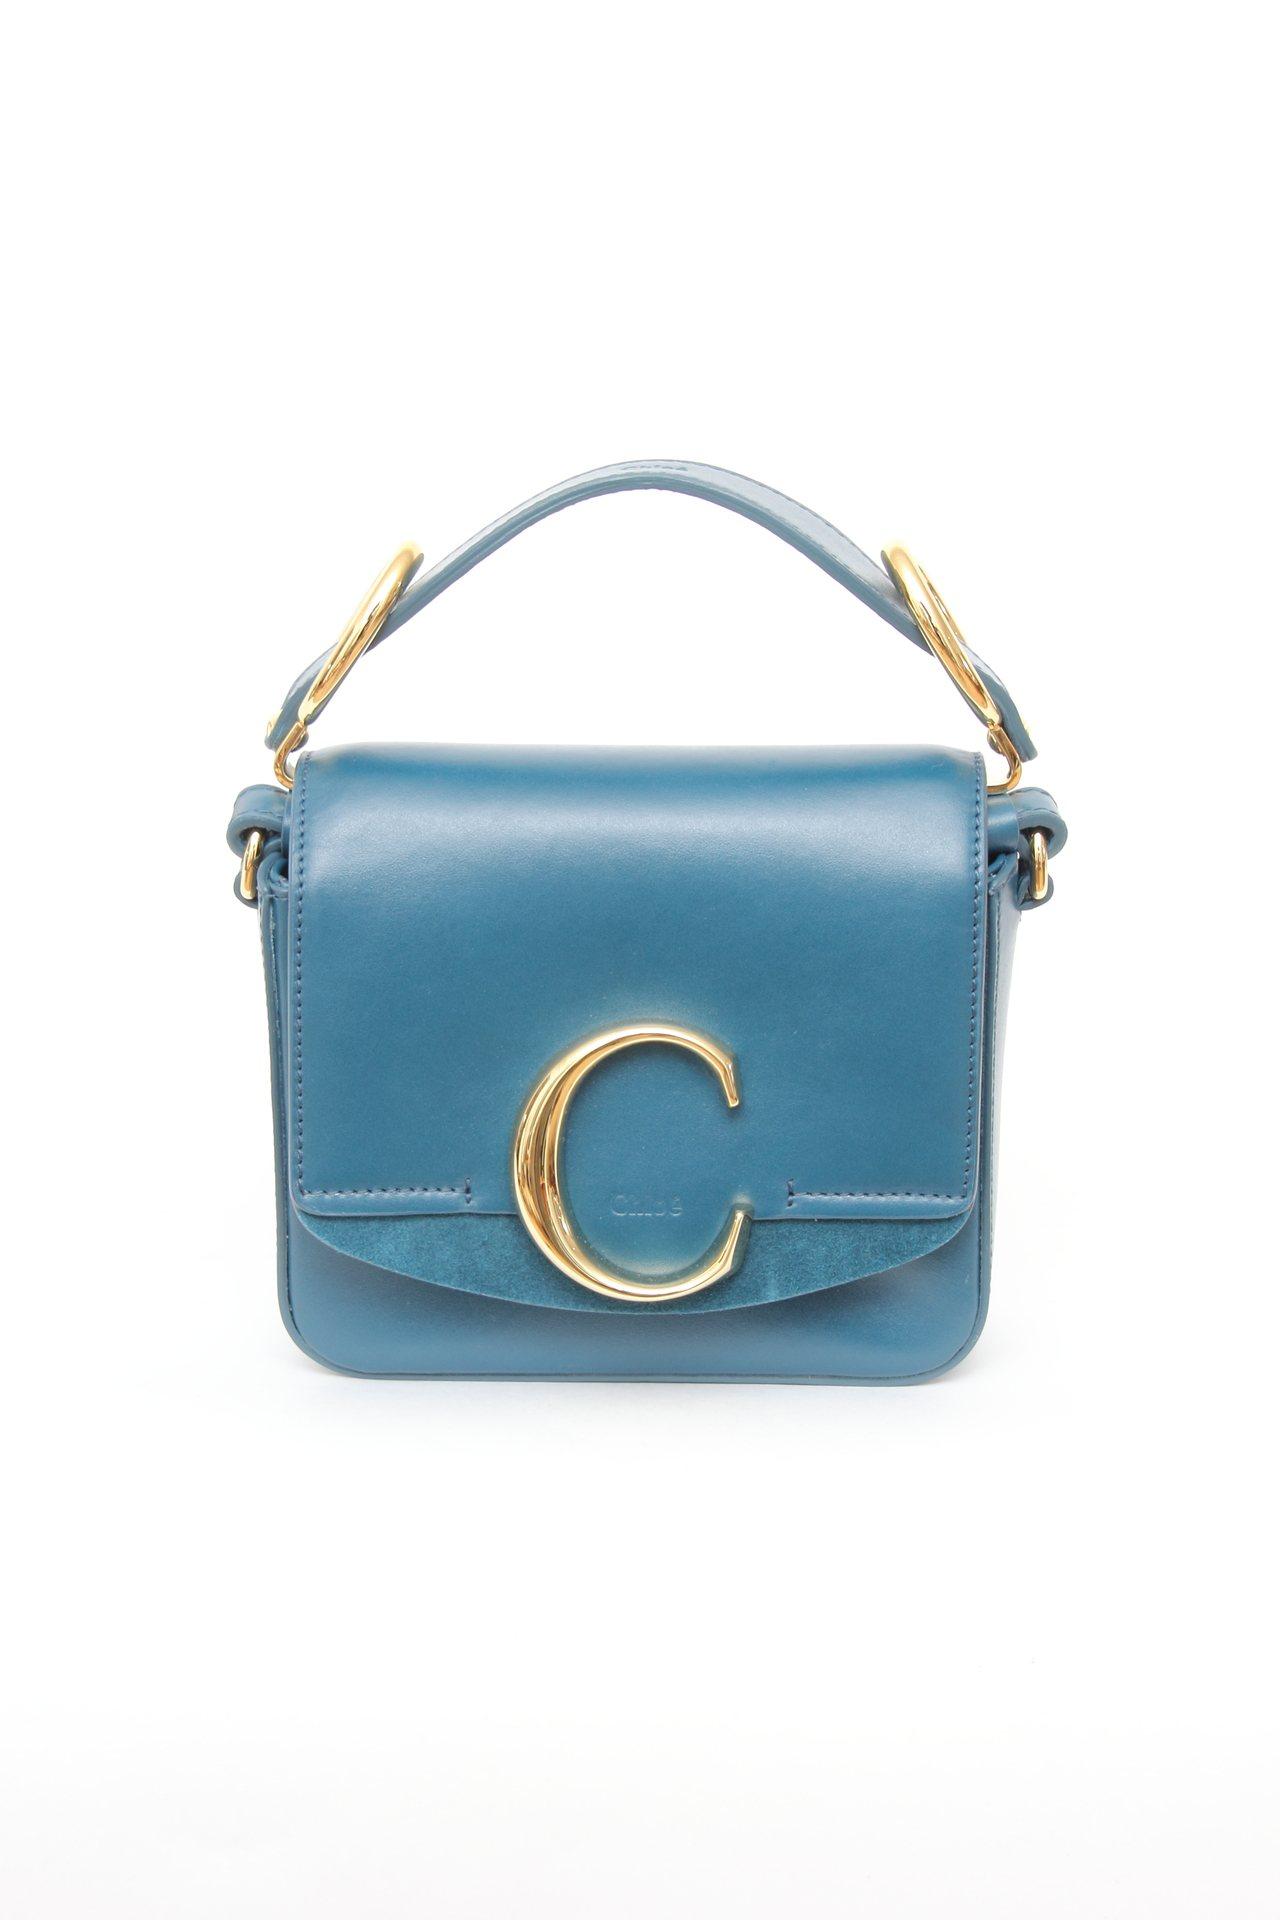 Chloé C墨水藍迷你小方包,售價44,400元。圖/Chloé提供